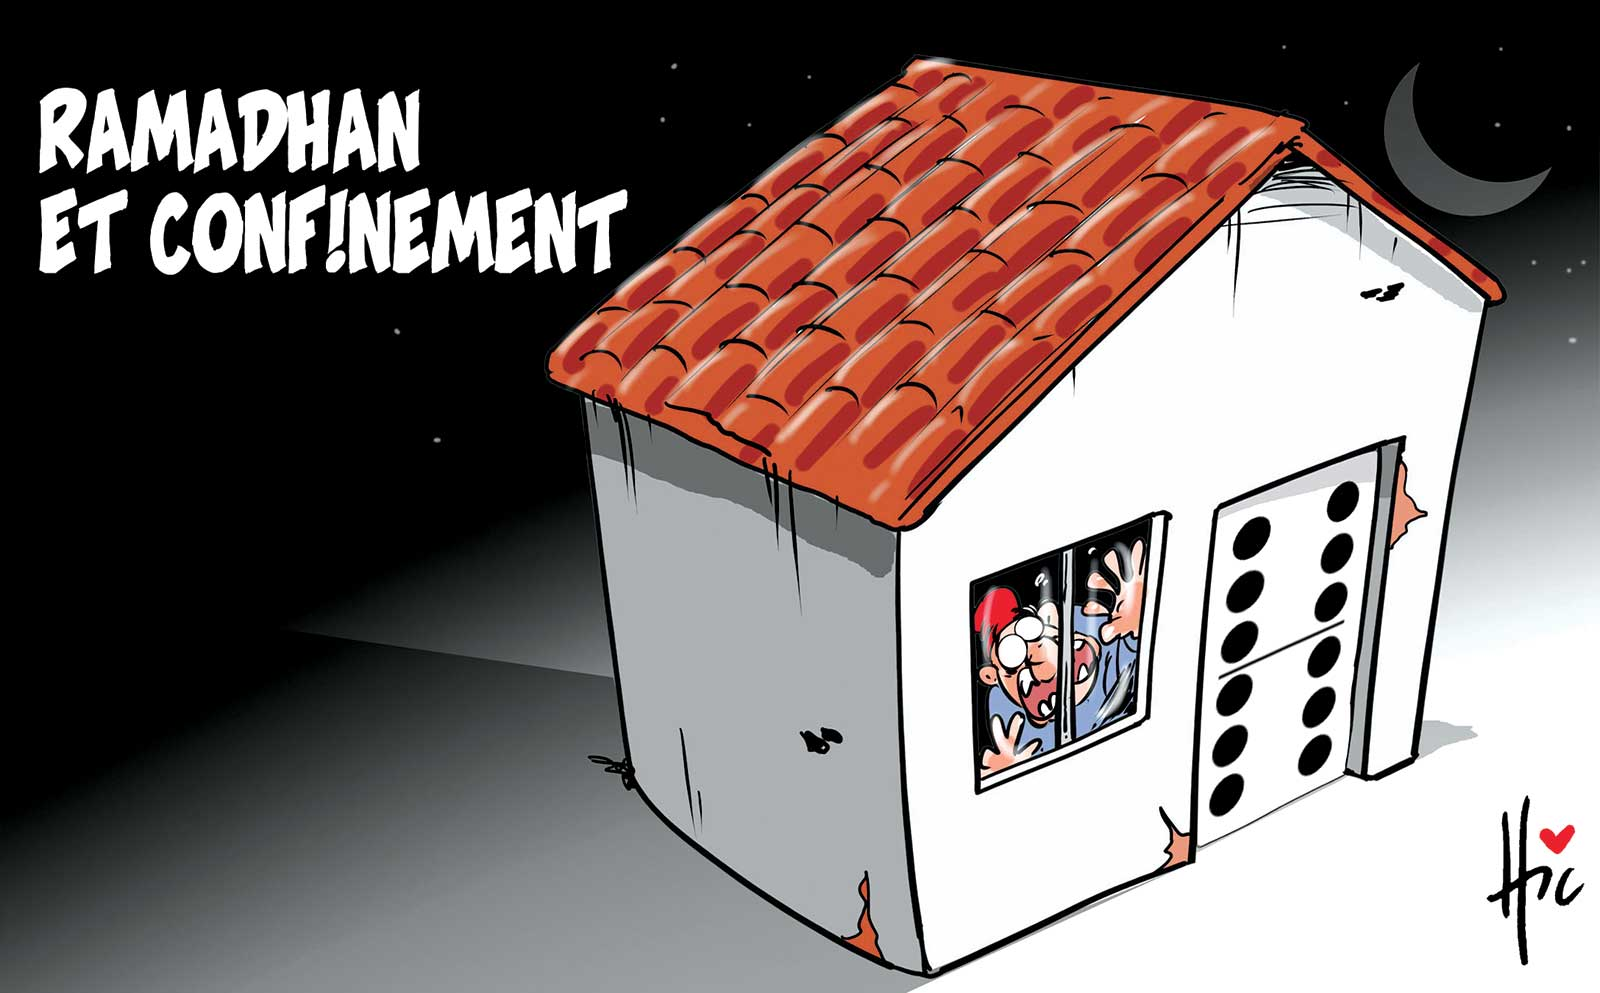 ramadan en confinement - Dessins et Caricatures, Le Hic - El Watan - Gagdz.com